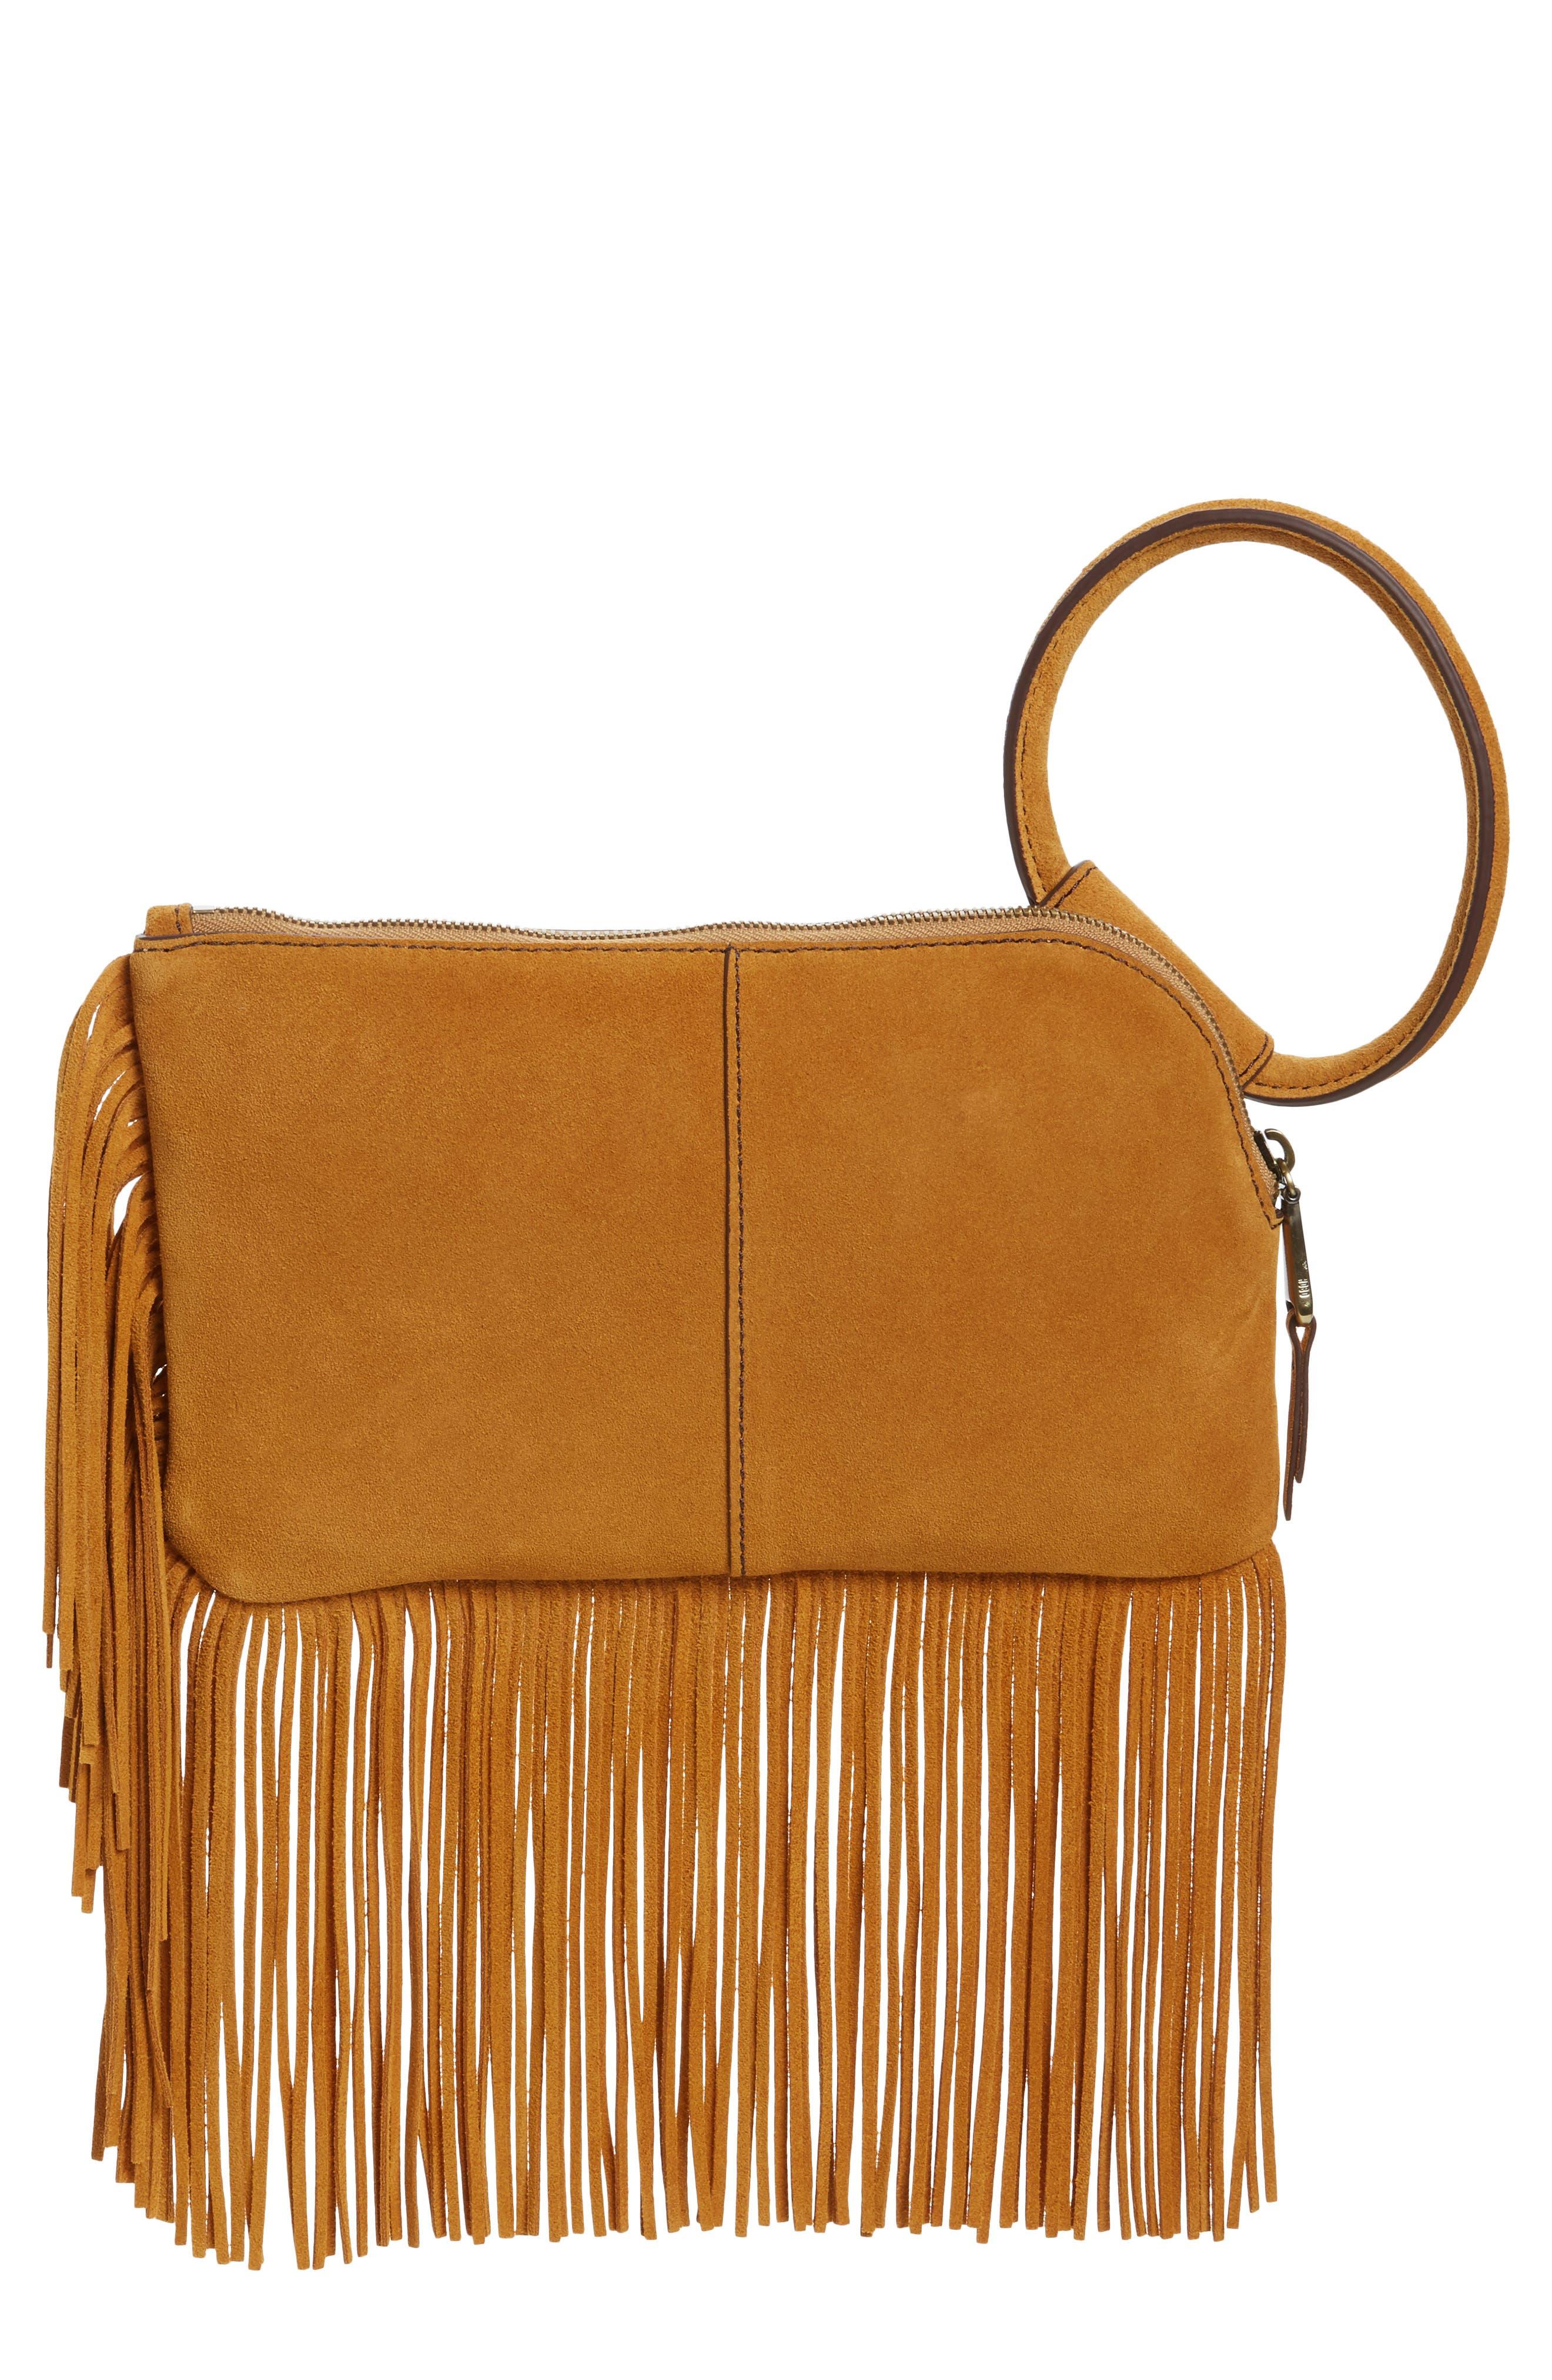 Sable Leather Clutch,                         Main,                         color, 250